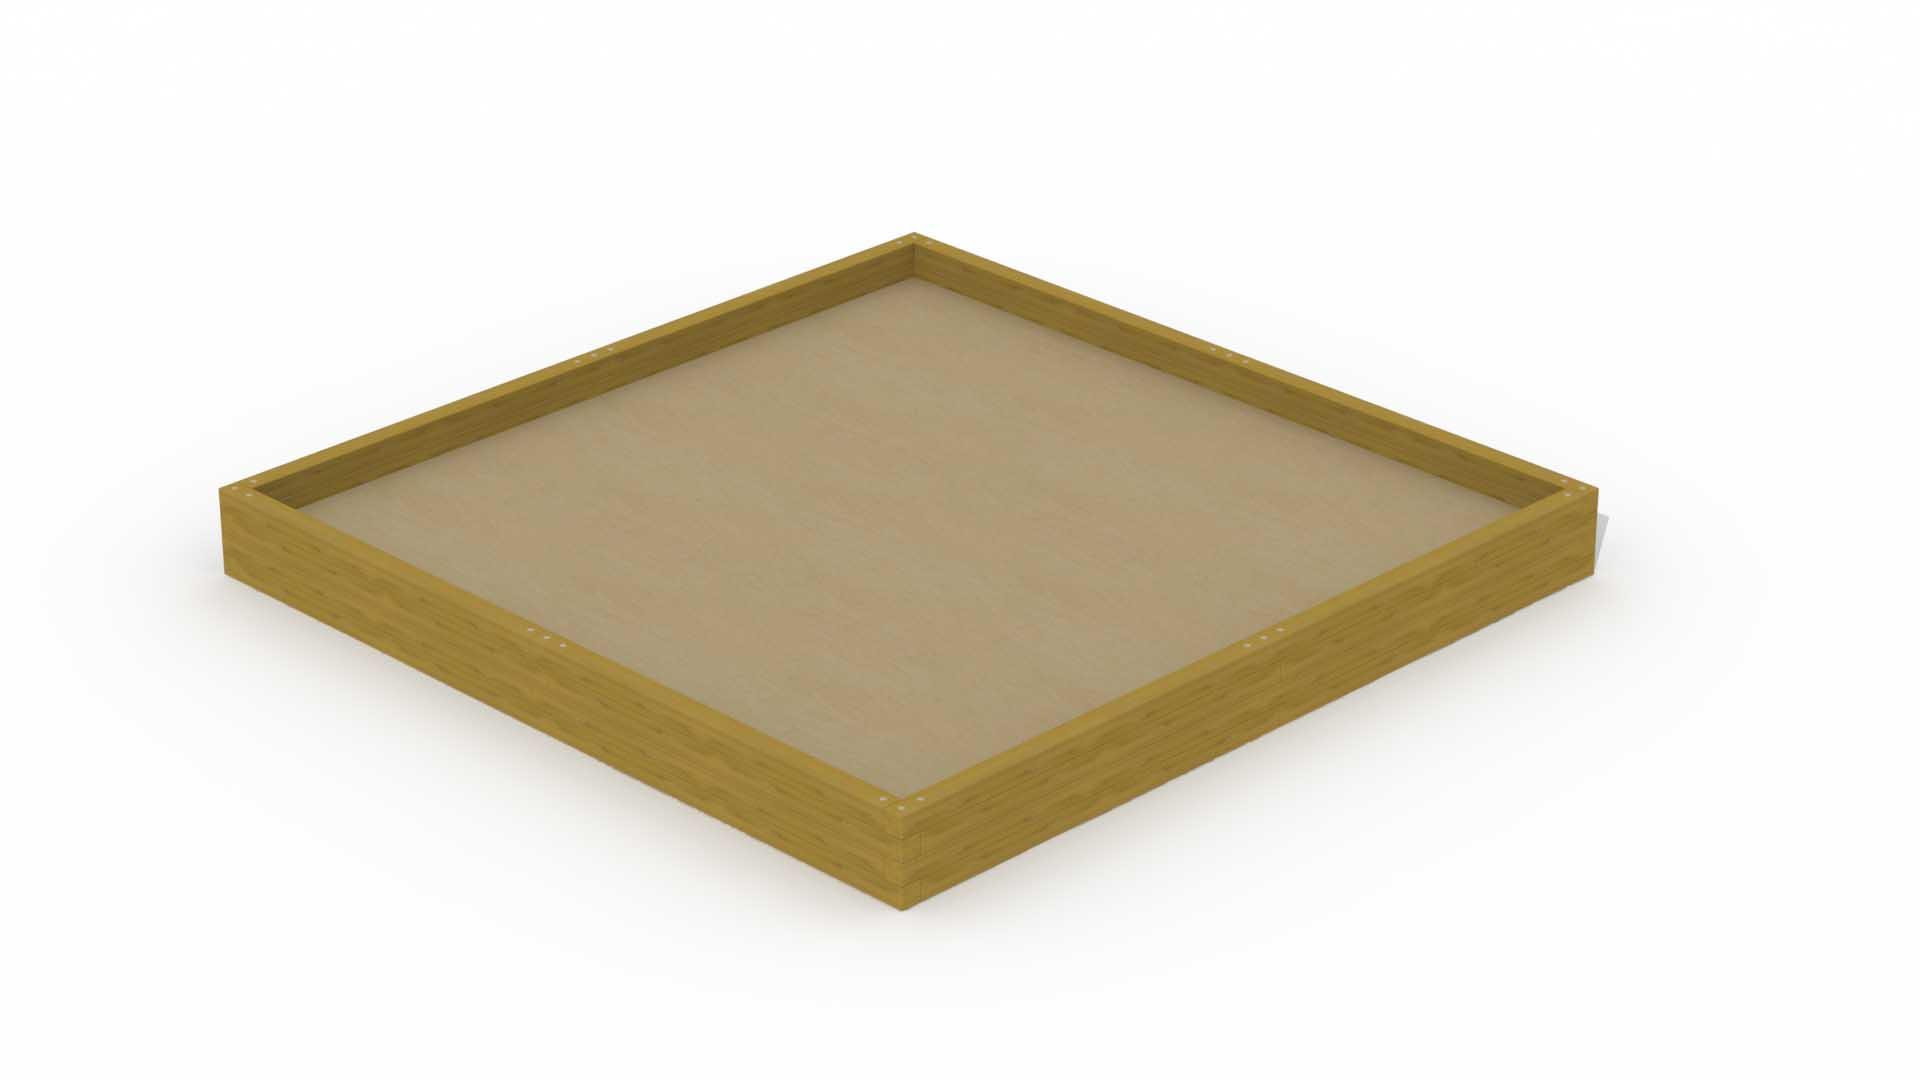 Beam Sandbox (3,6 X 3,6 M)